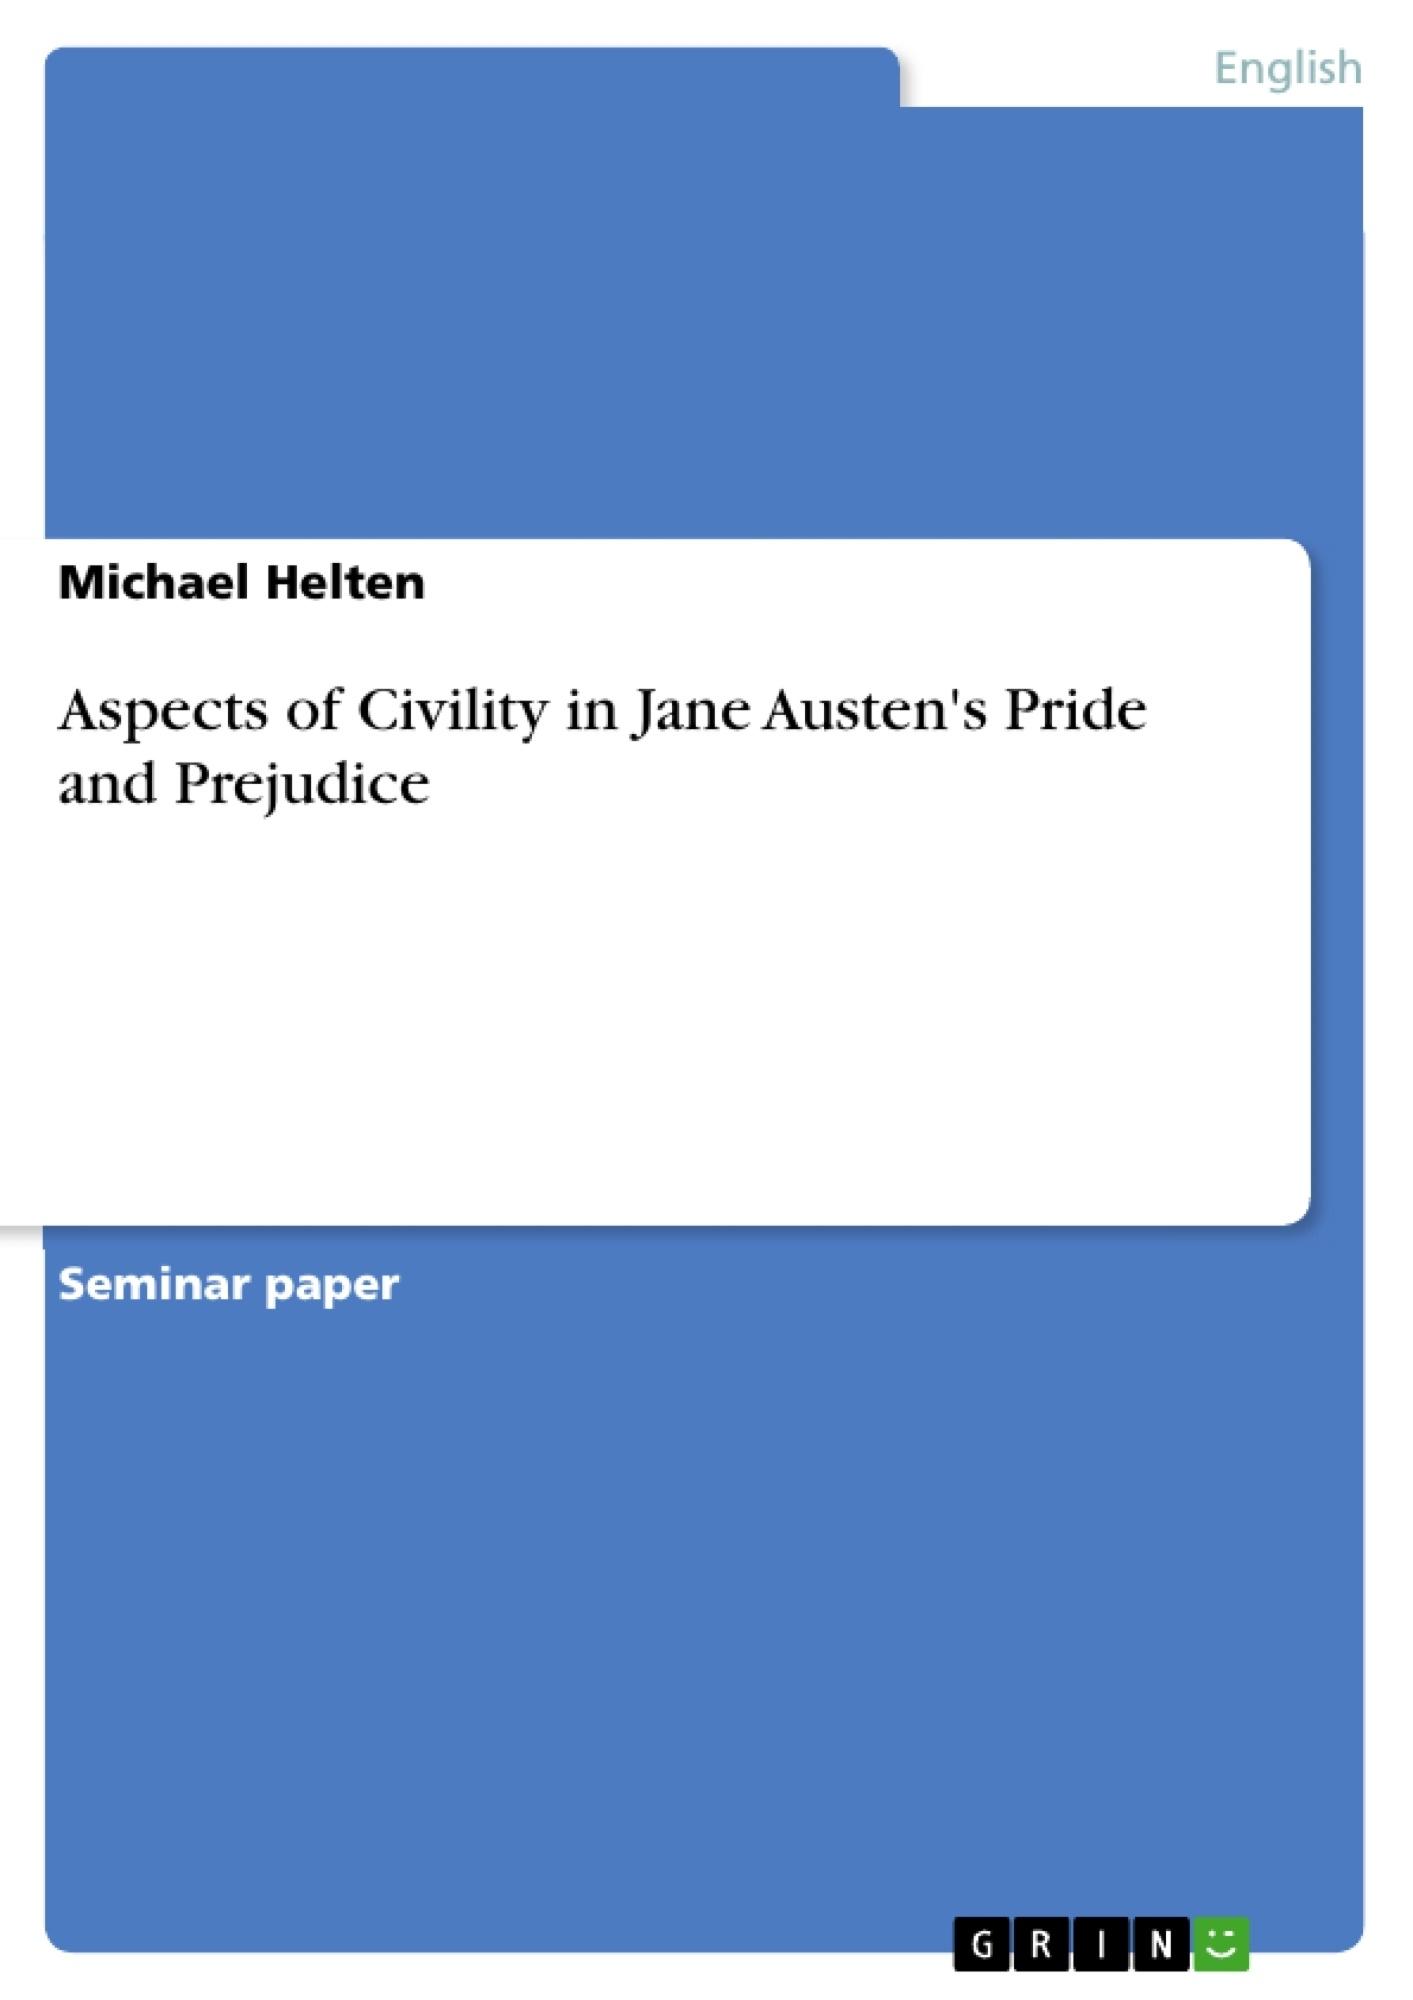 Title: Aspects of Civility in Jane Austen's Pride and Prejudice